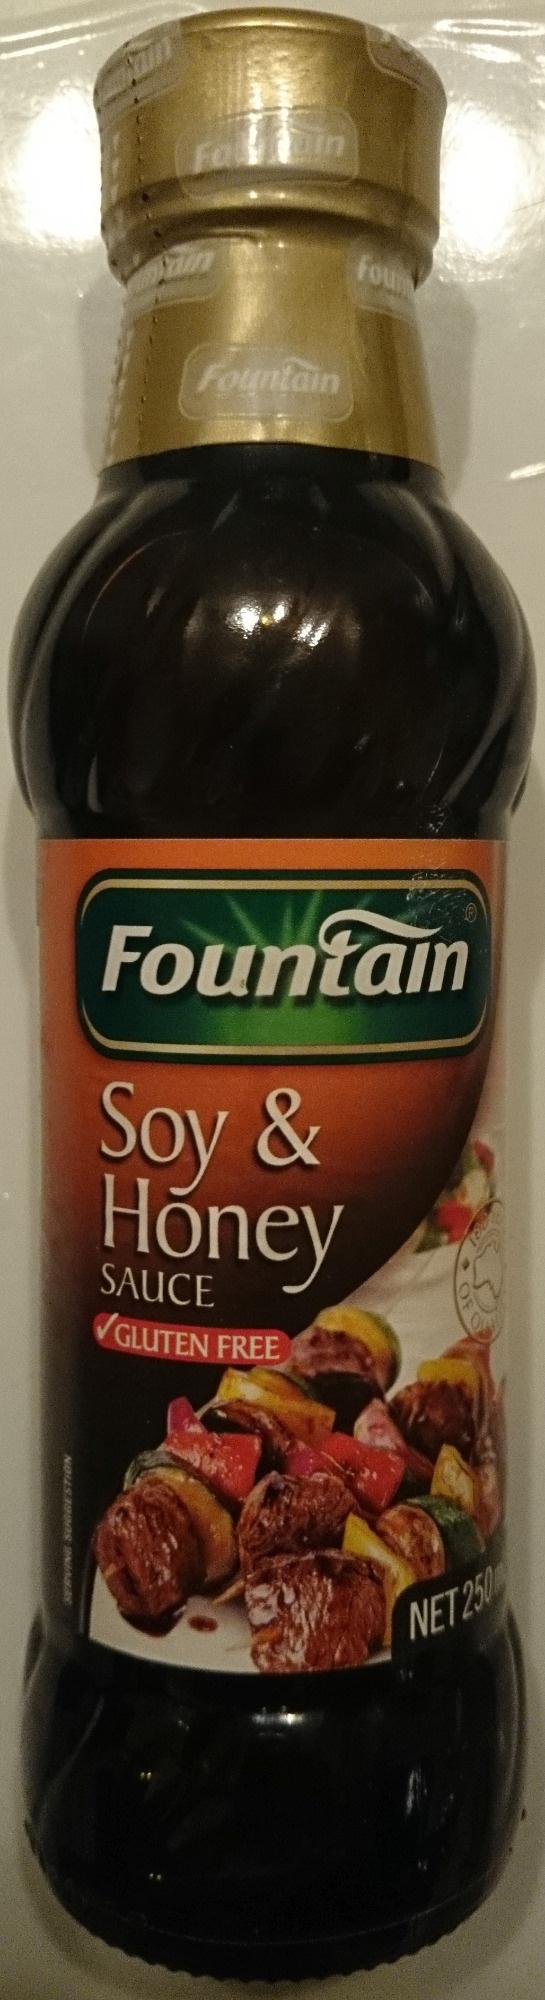 Fountain Soy & Honey Sauce - Product - en